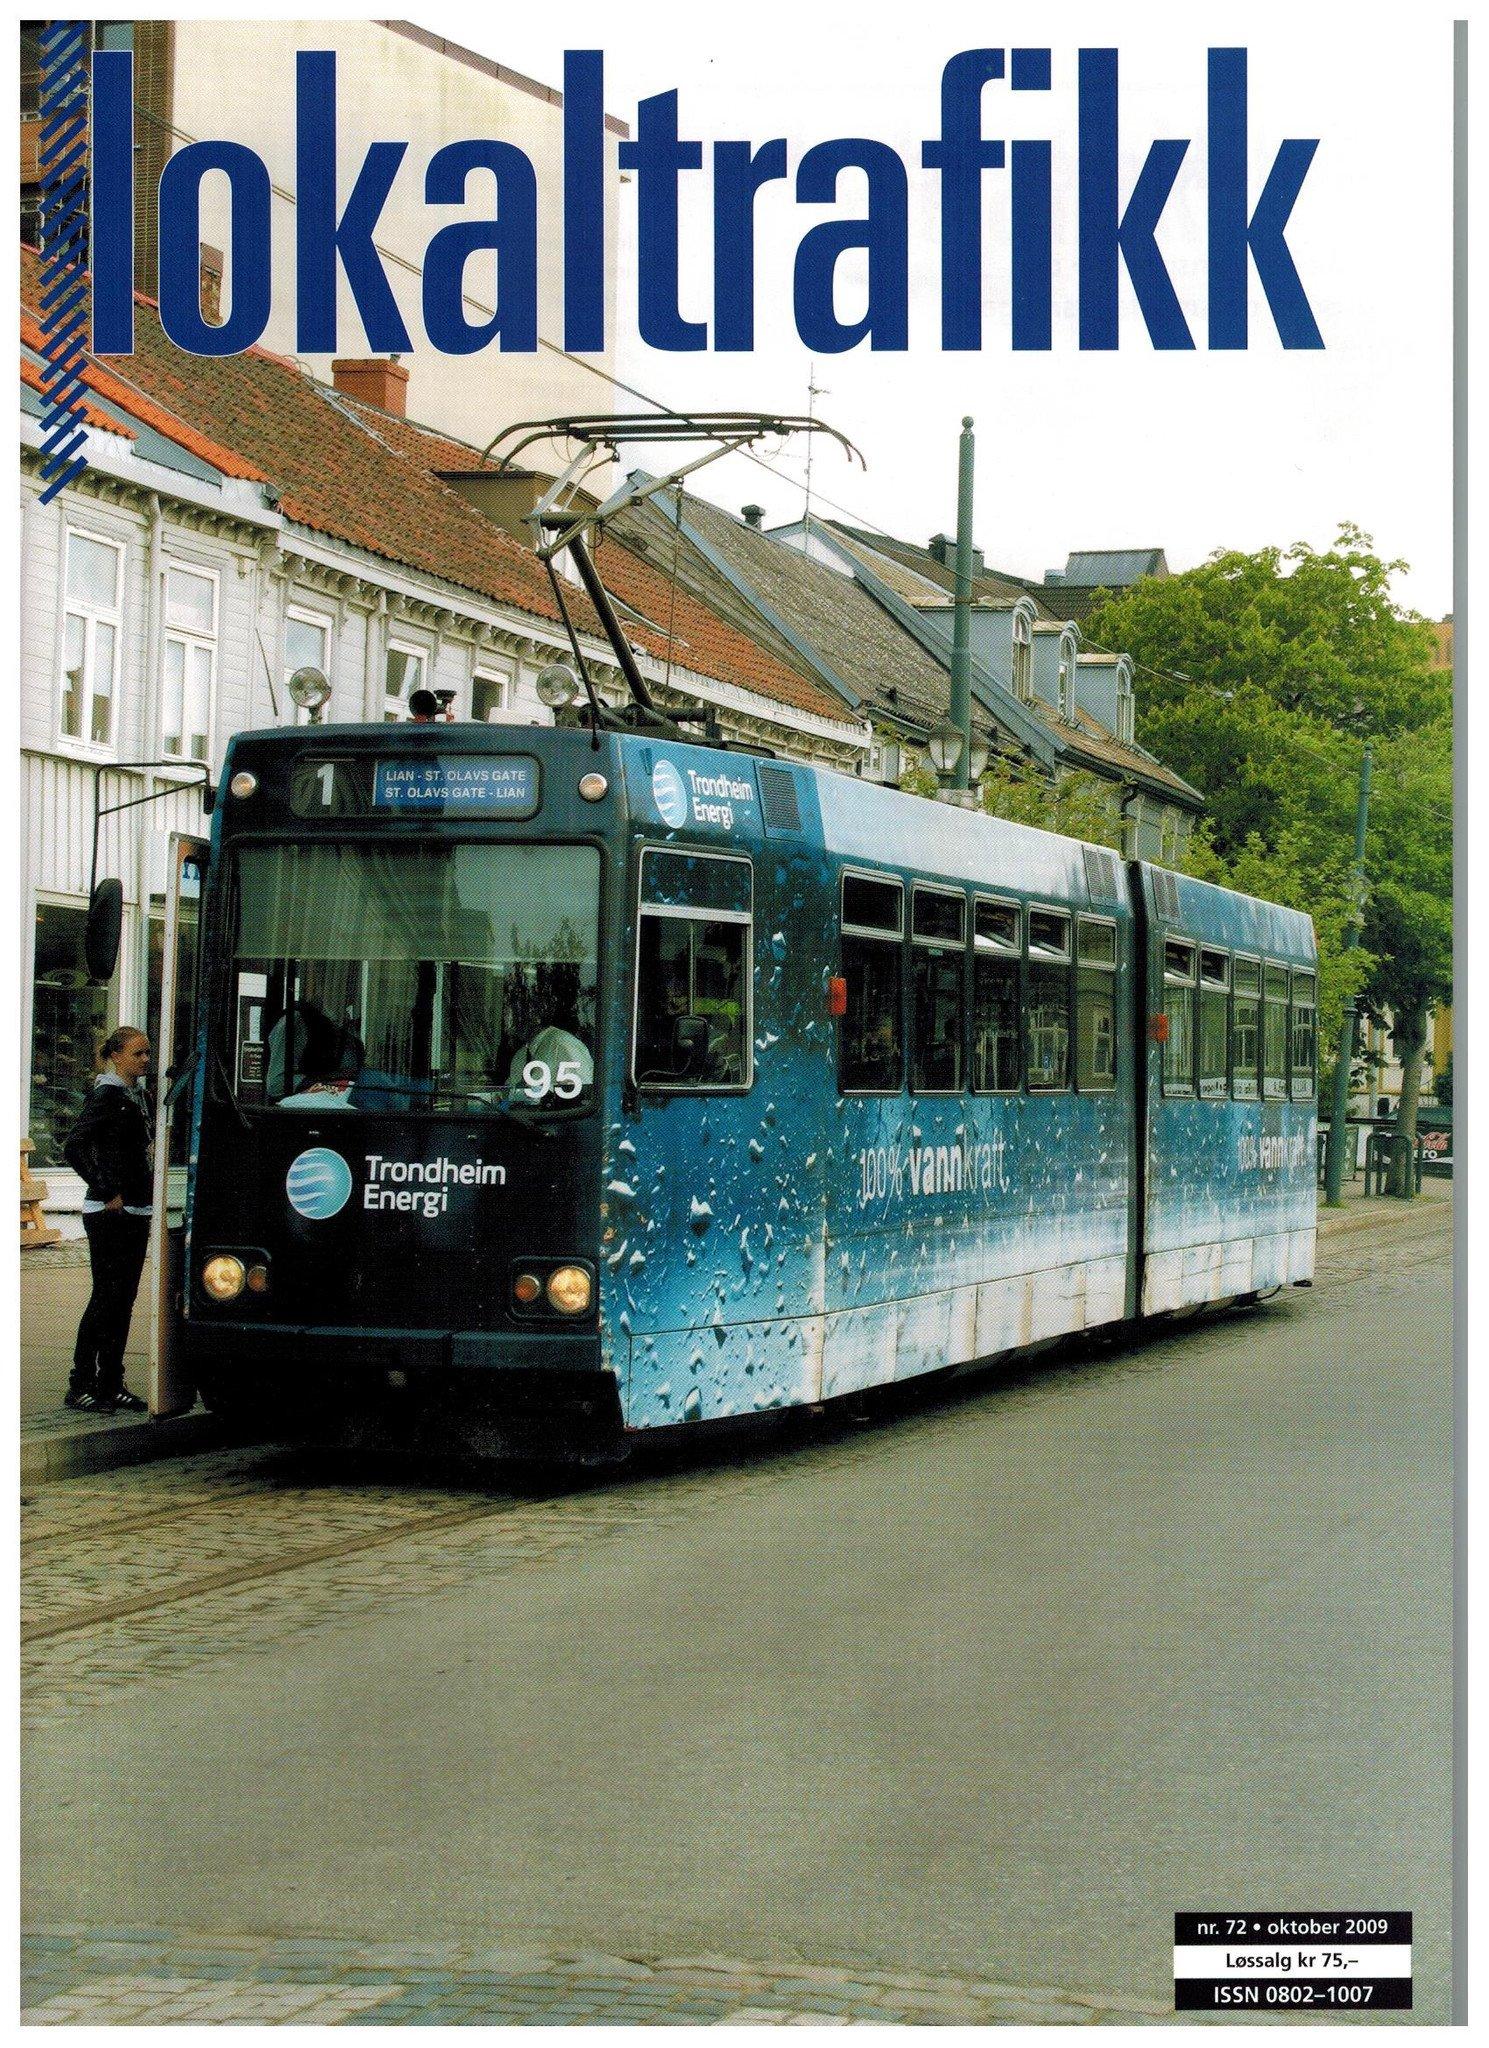 Lokaltrafikk #072